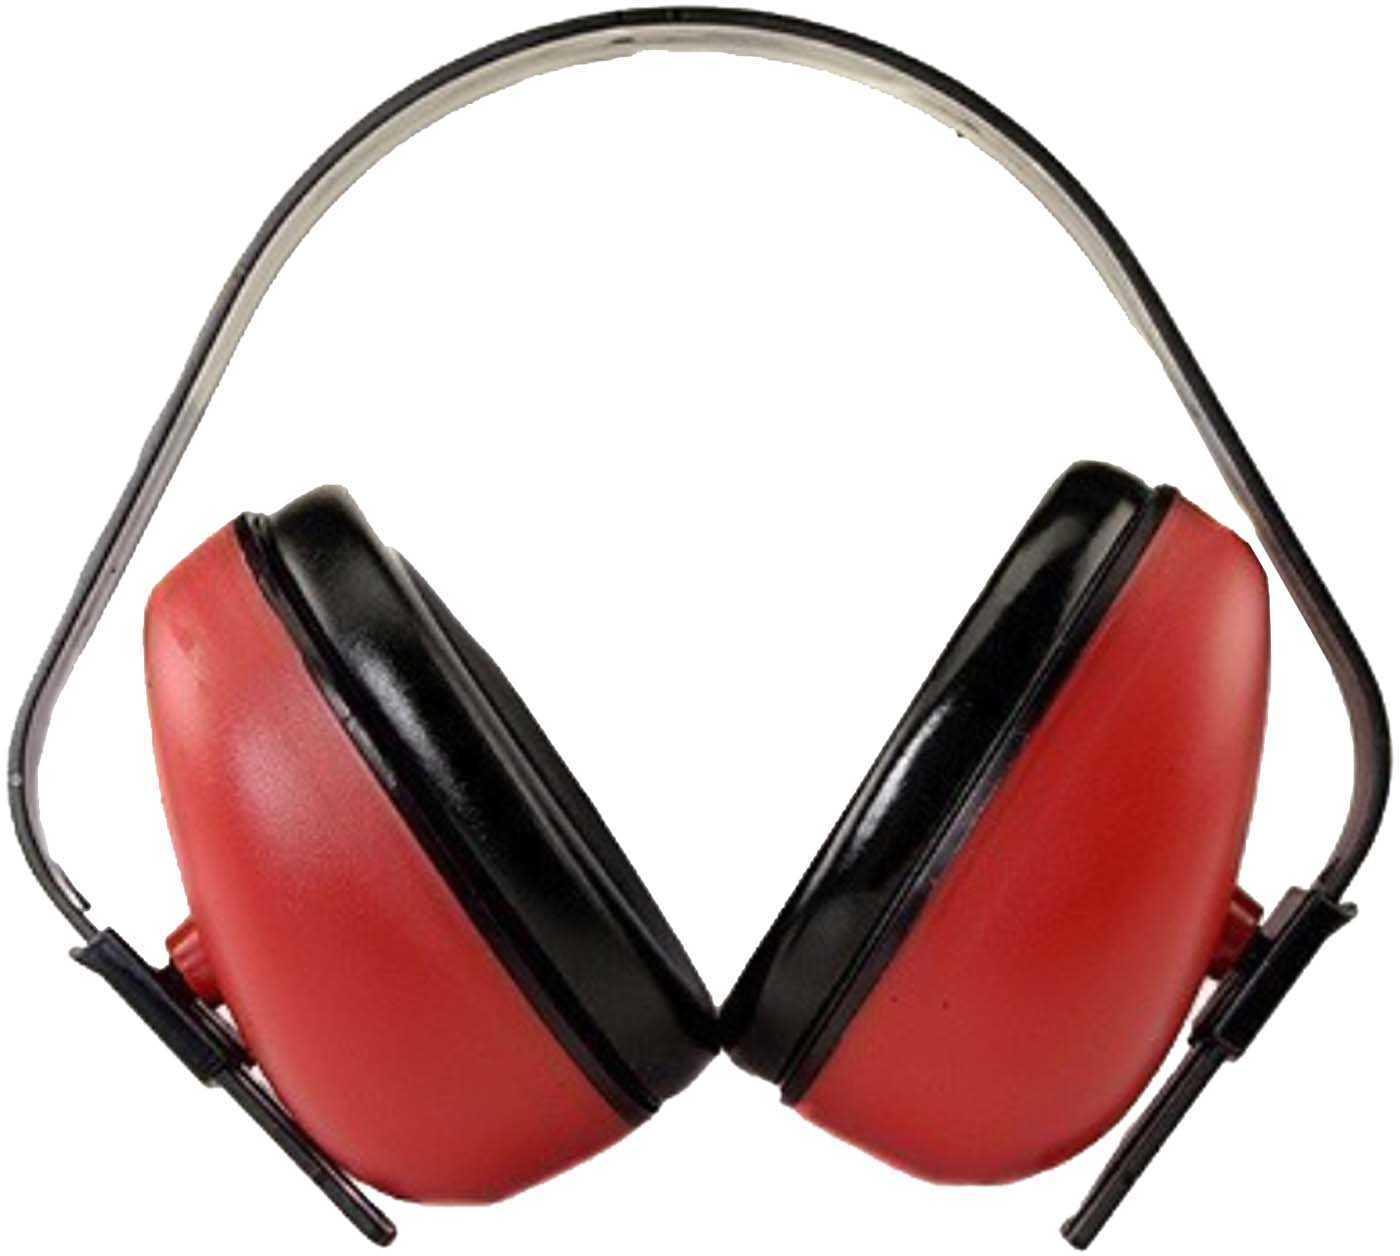 Radians Lightweight Adjustable Earmuffs With Foam Filled Ear Cups Md: DF0310HC